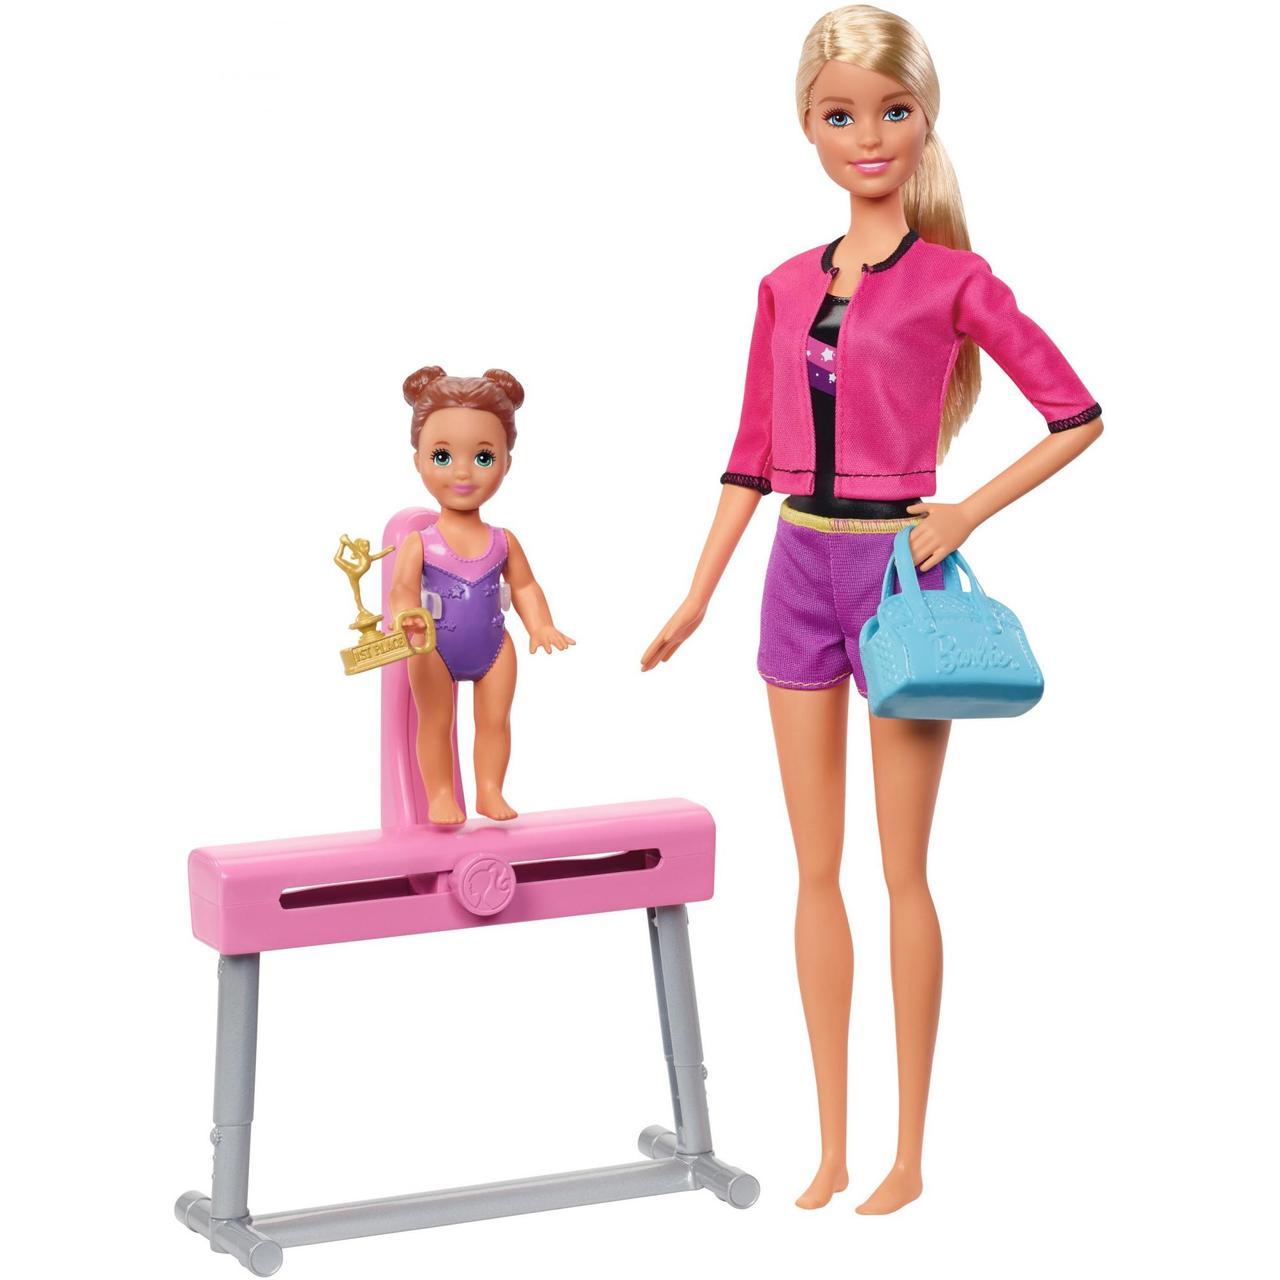 Барби тренер по гимнастике Barbie Gymnastics Coach & Student Doll Balance Beam Playset